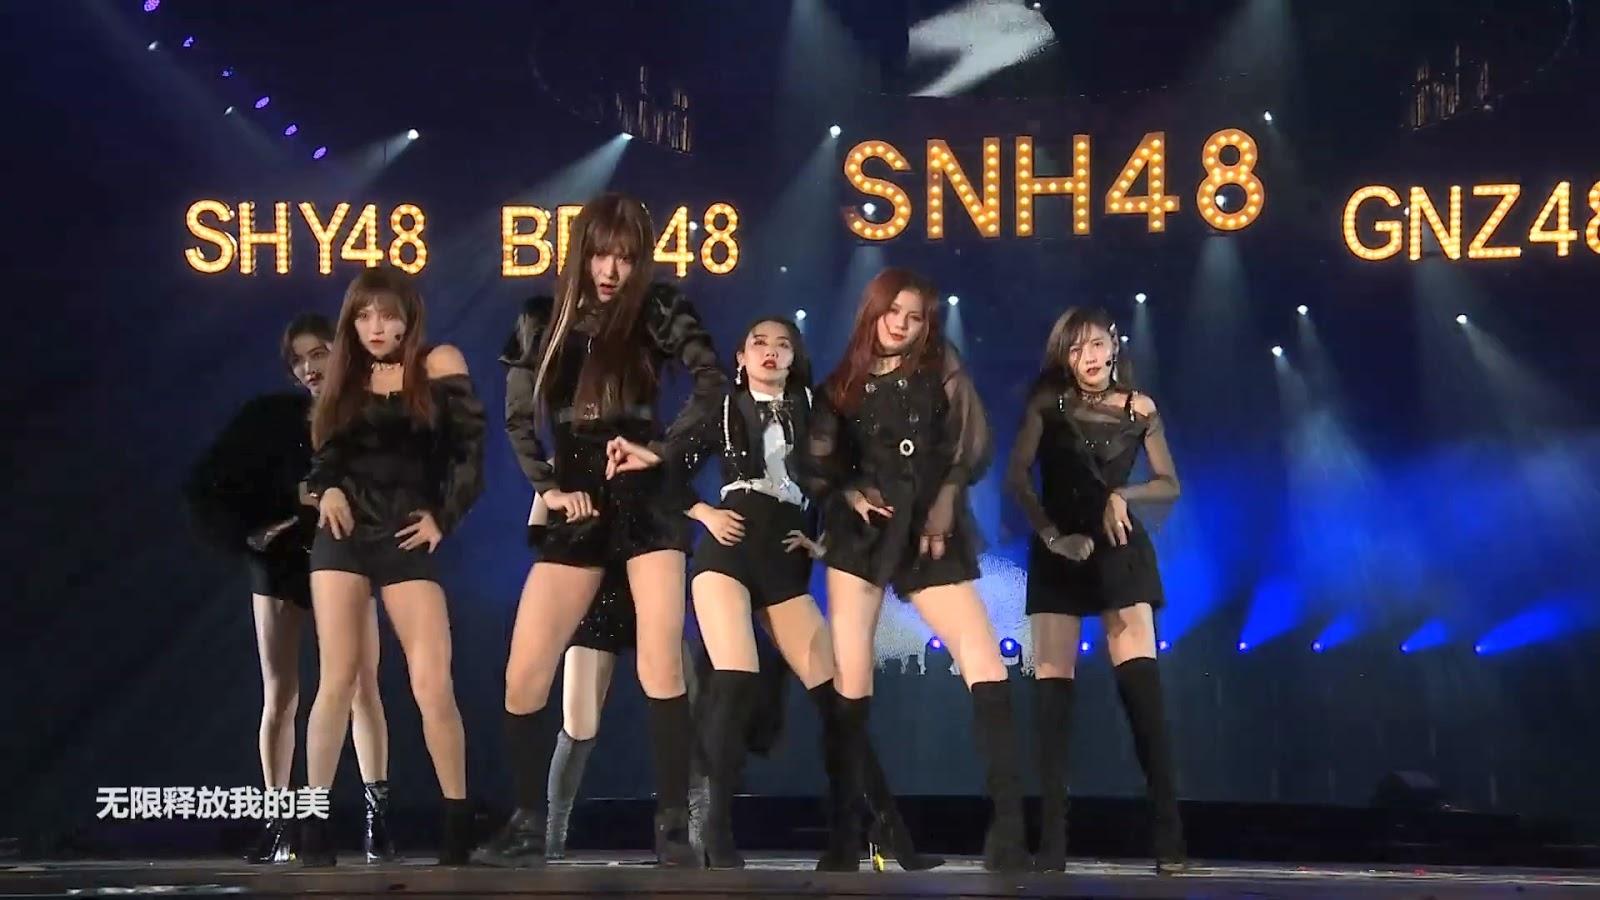 All About GIRLS' K-POPSNH48のK-POPスタイルユニット7SENSES、第5回リクエストアワーBEST50で最新曲「SWAN」を披露…昨年末の音楽番組以来の豪華なステージ